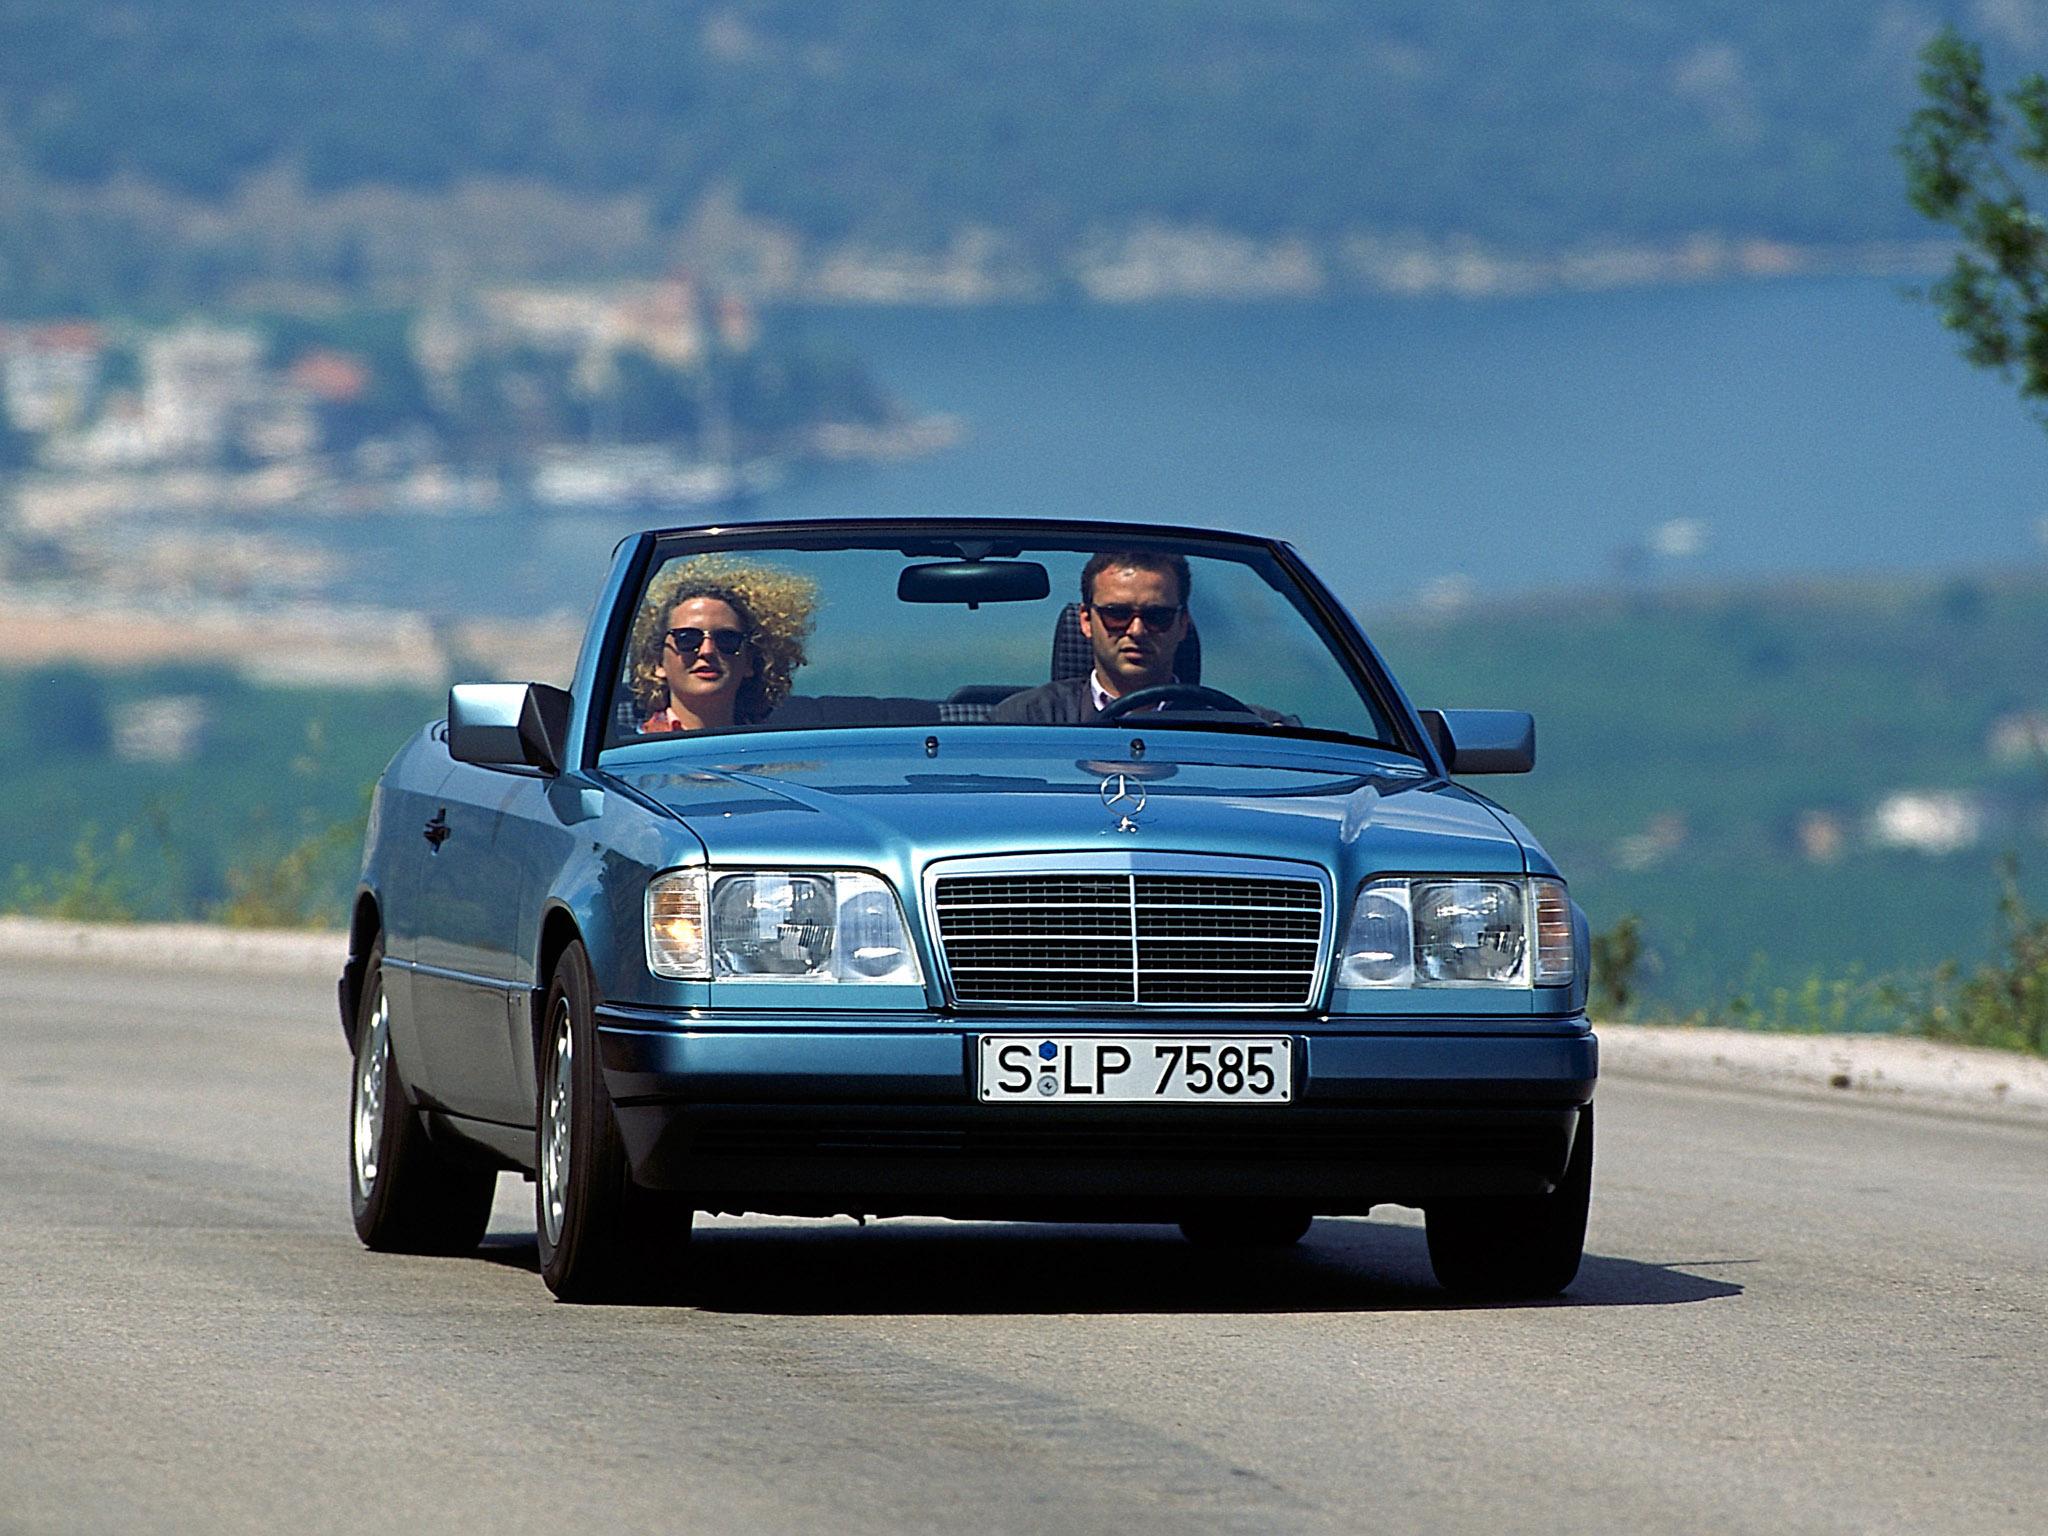 mercedes e klasse e220 cabrio a124 1993 1997 mercedes e klasse e220 cabrio a124 1993 1997 photo. Black Bedroom Furniture Sets. Home Design Ideas